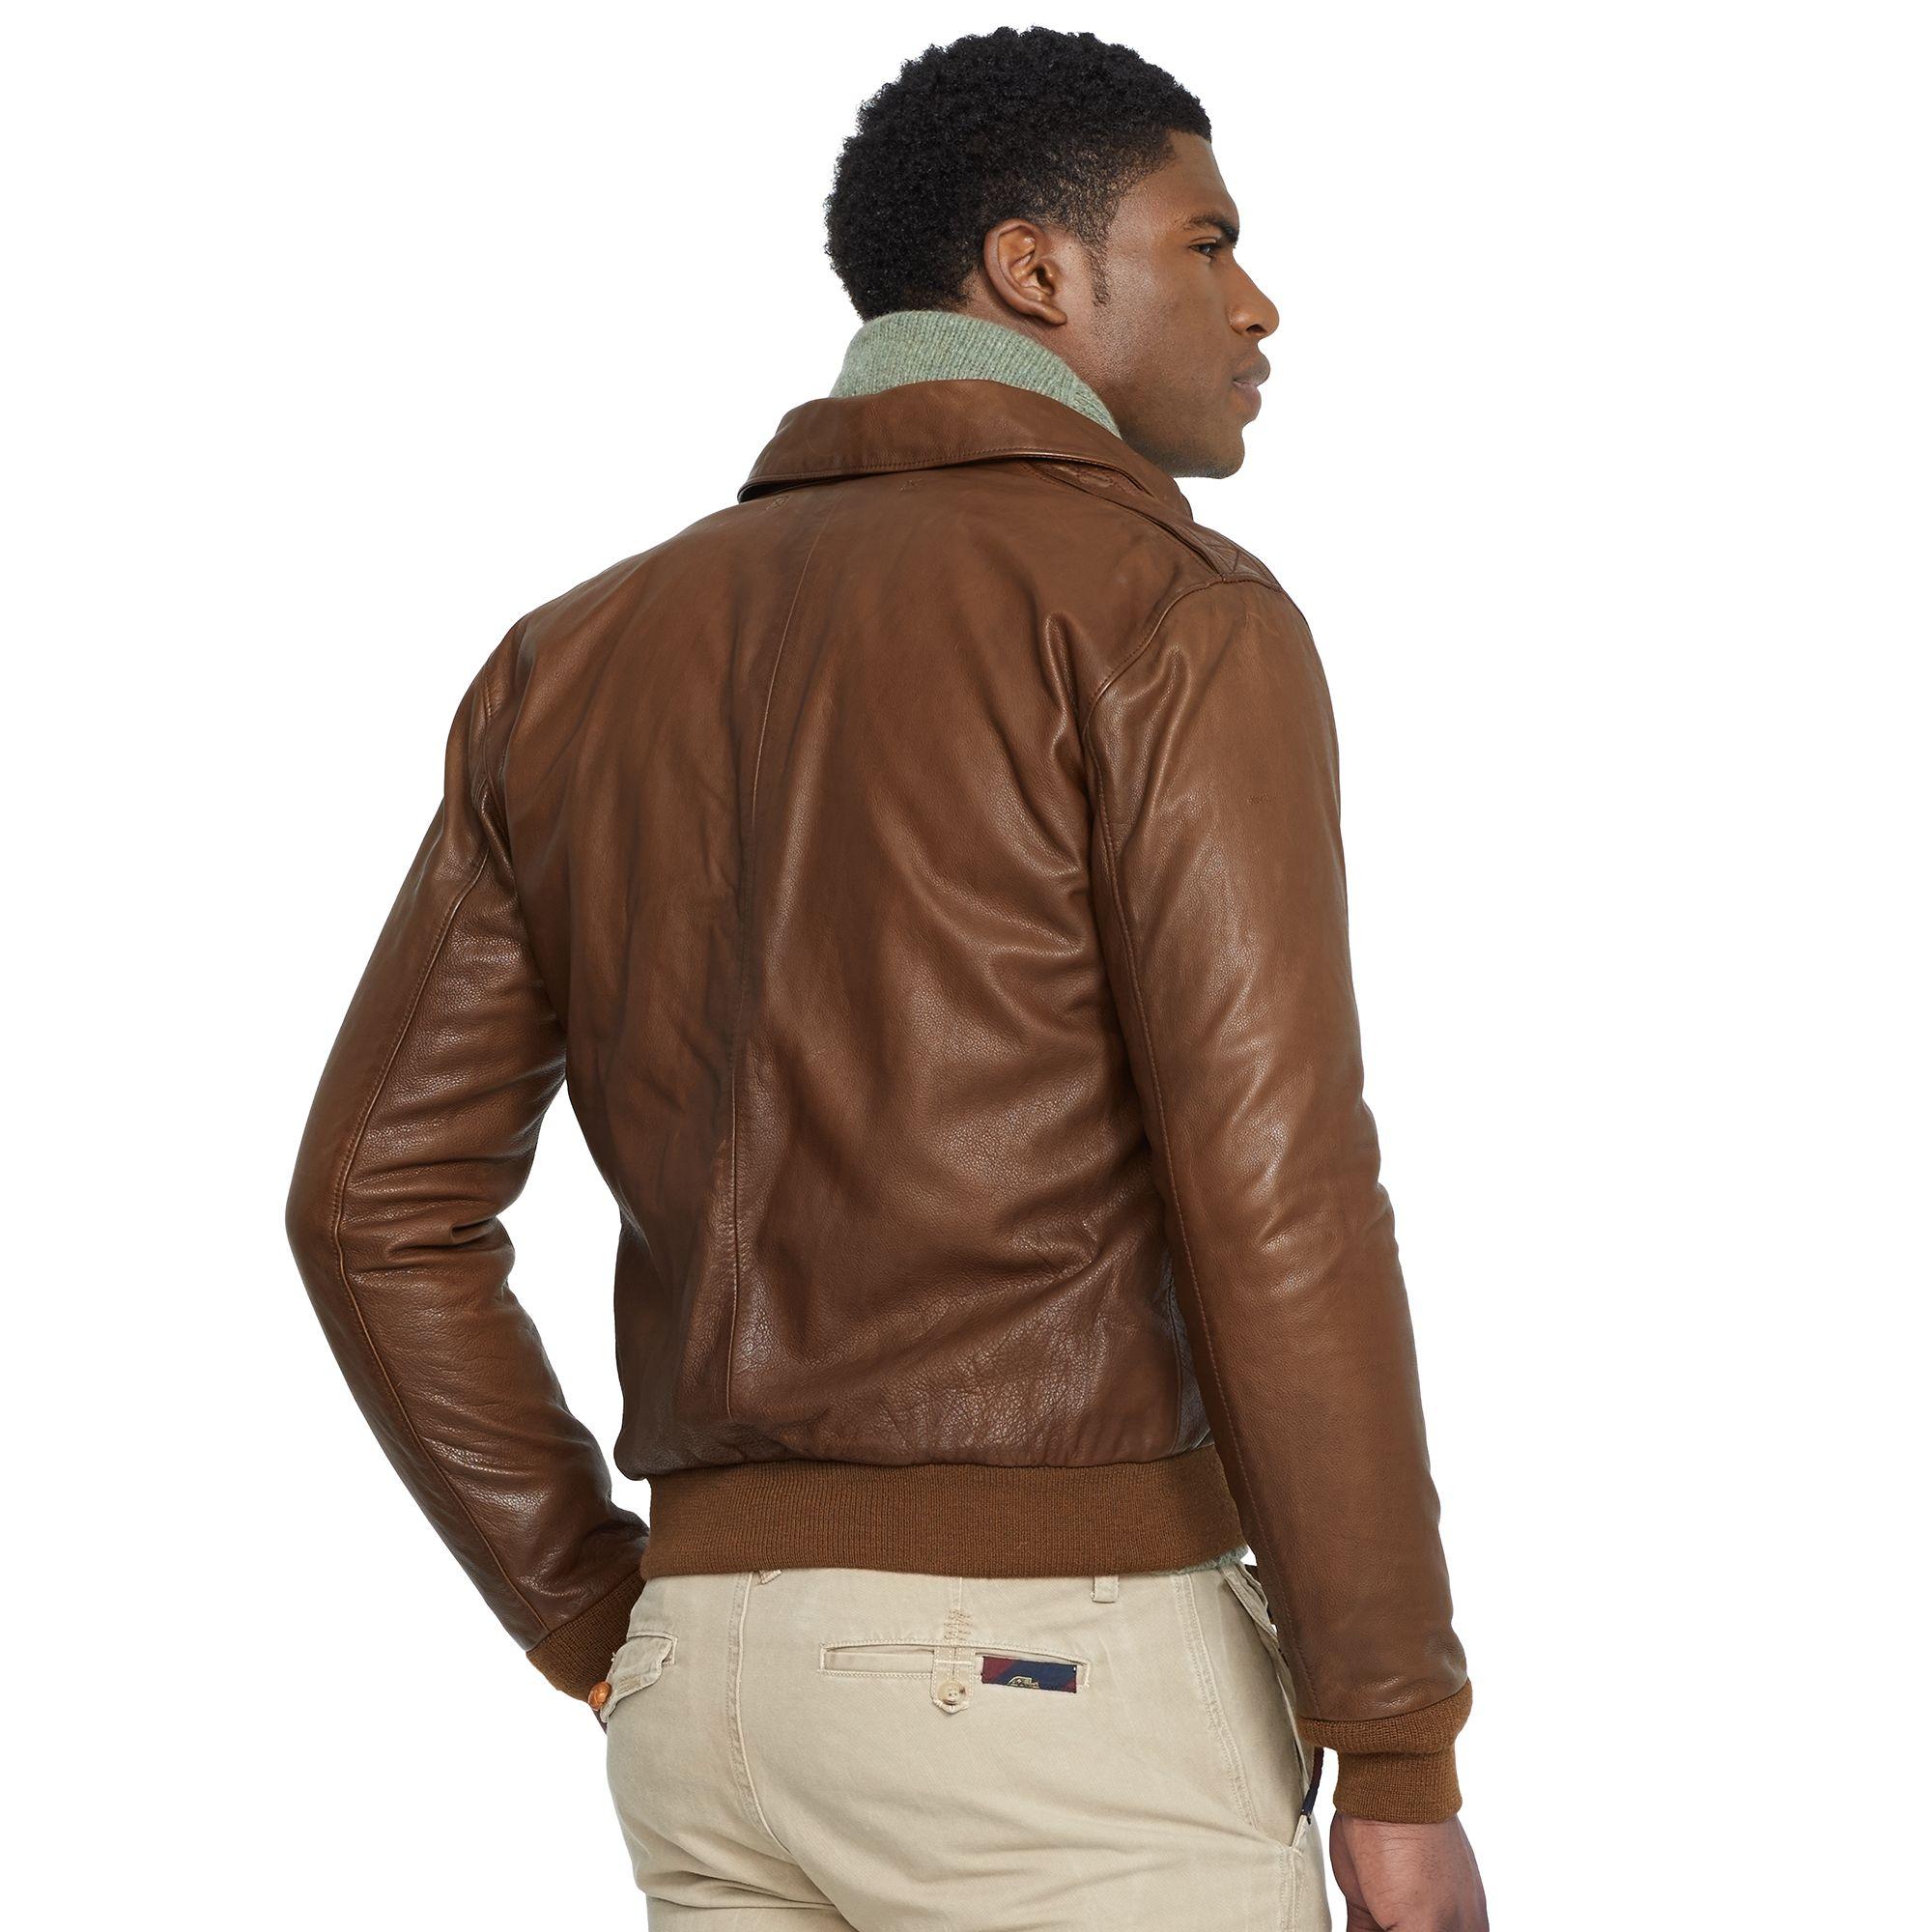 schön billig elegante Schuhe Outlet-Boutique Leather Farrington A2 Jacket